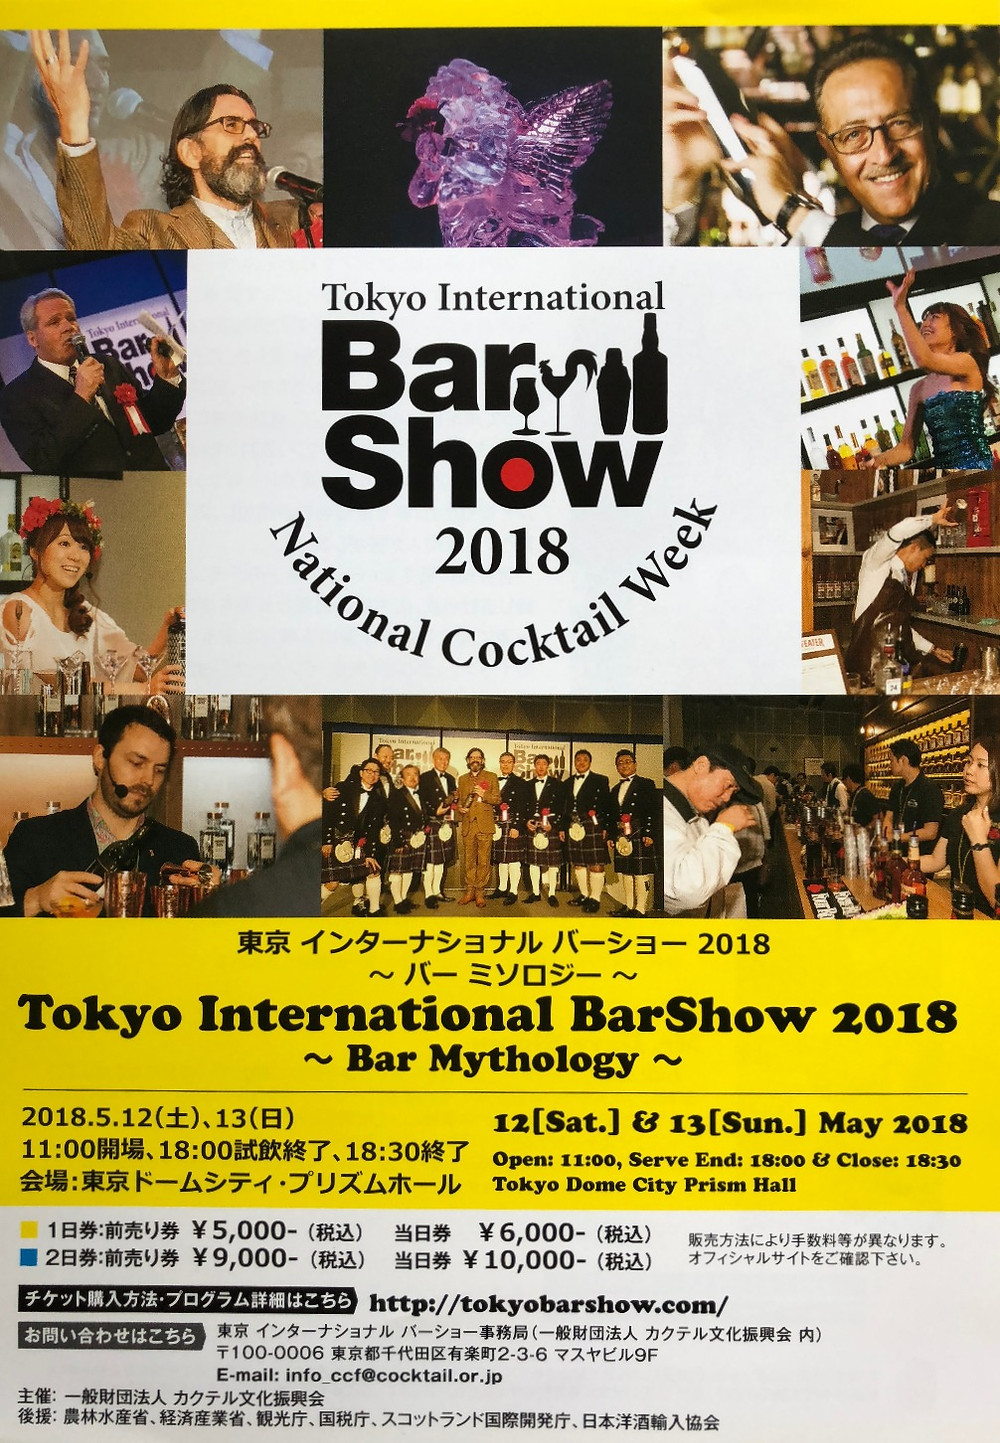 Tokyo International BarShow 2018 ~Bar Mythology~